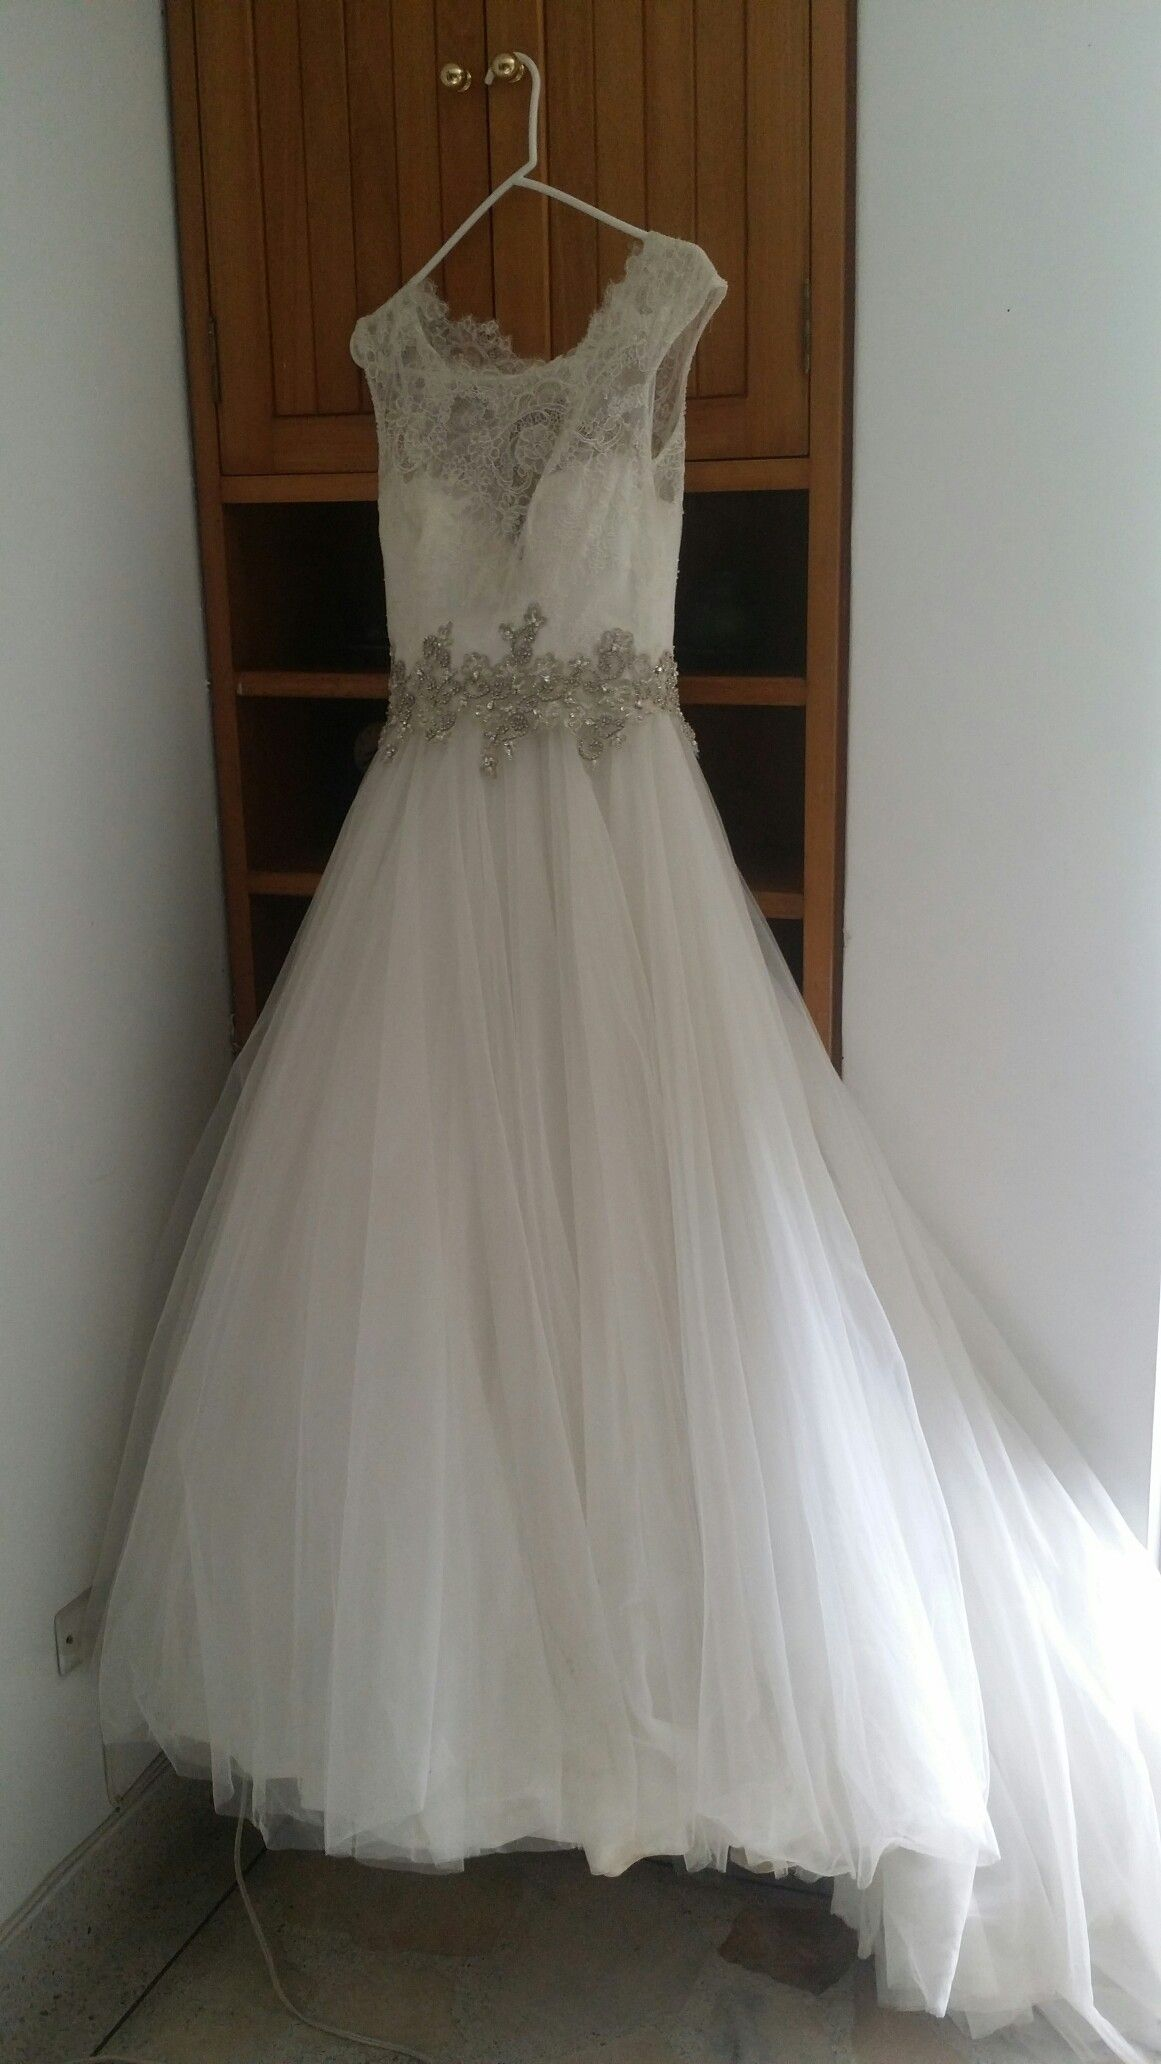 Vestido novia hermoso